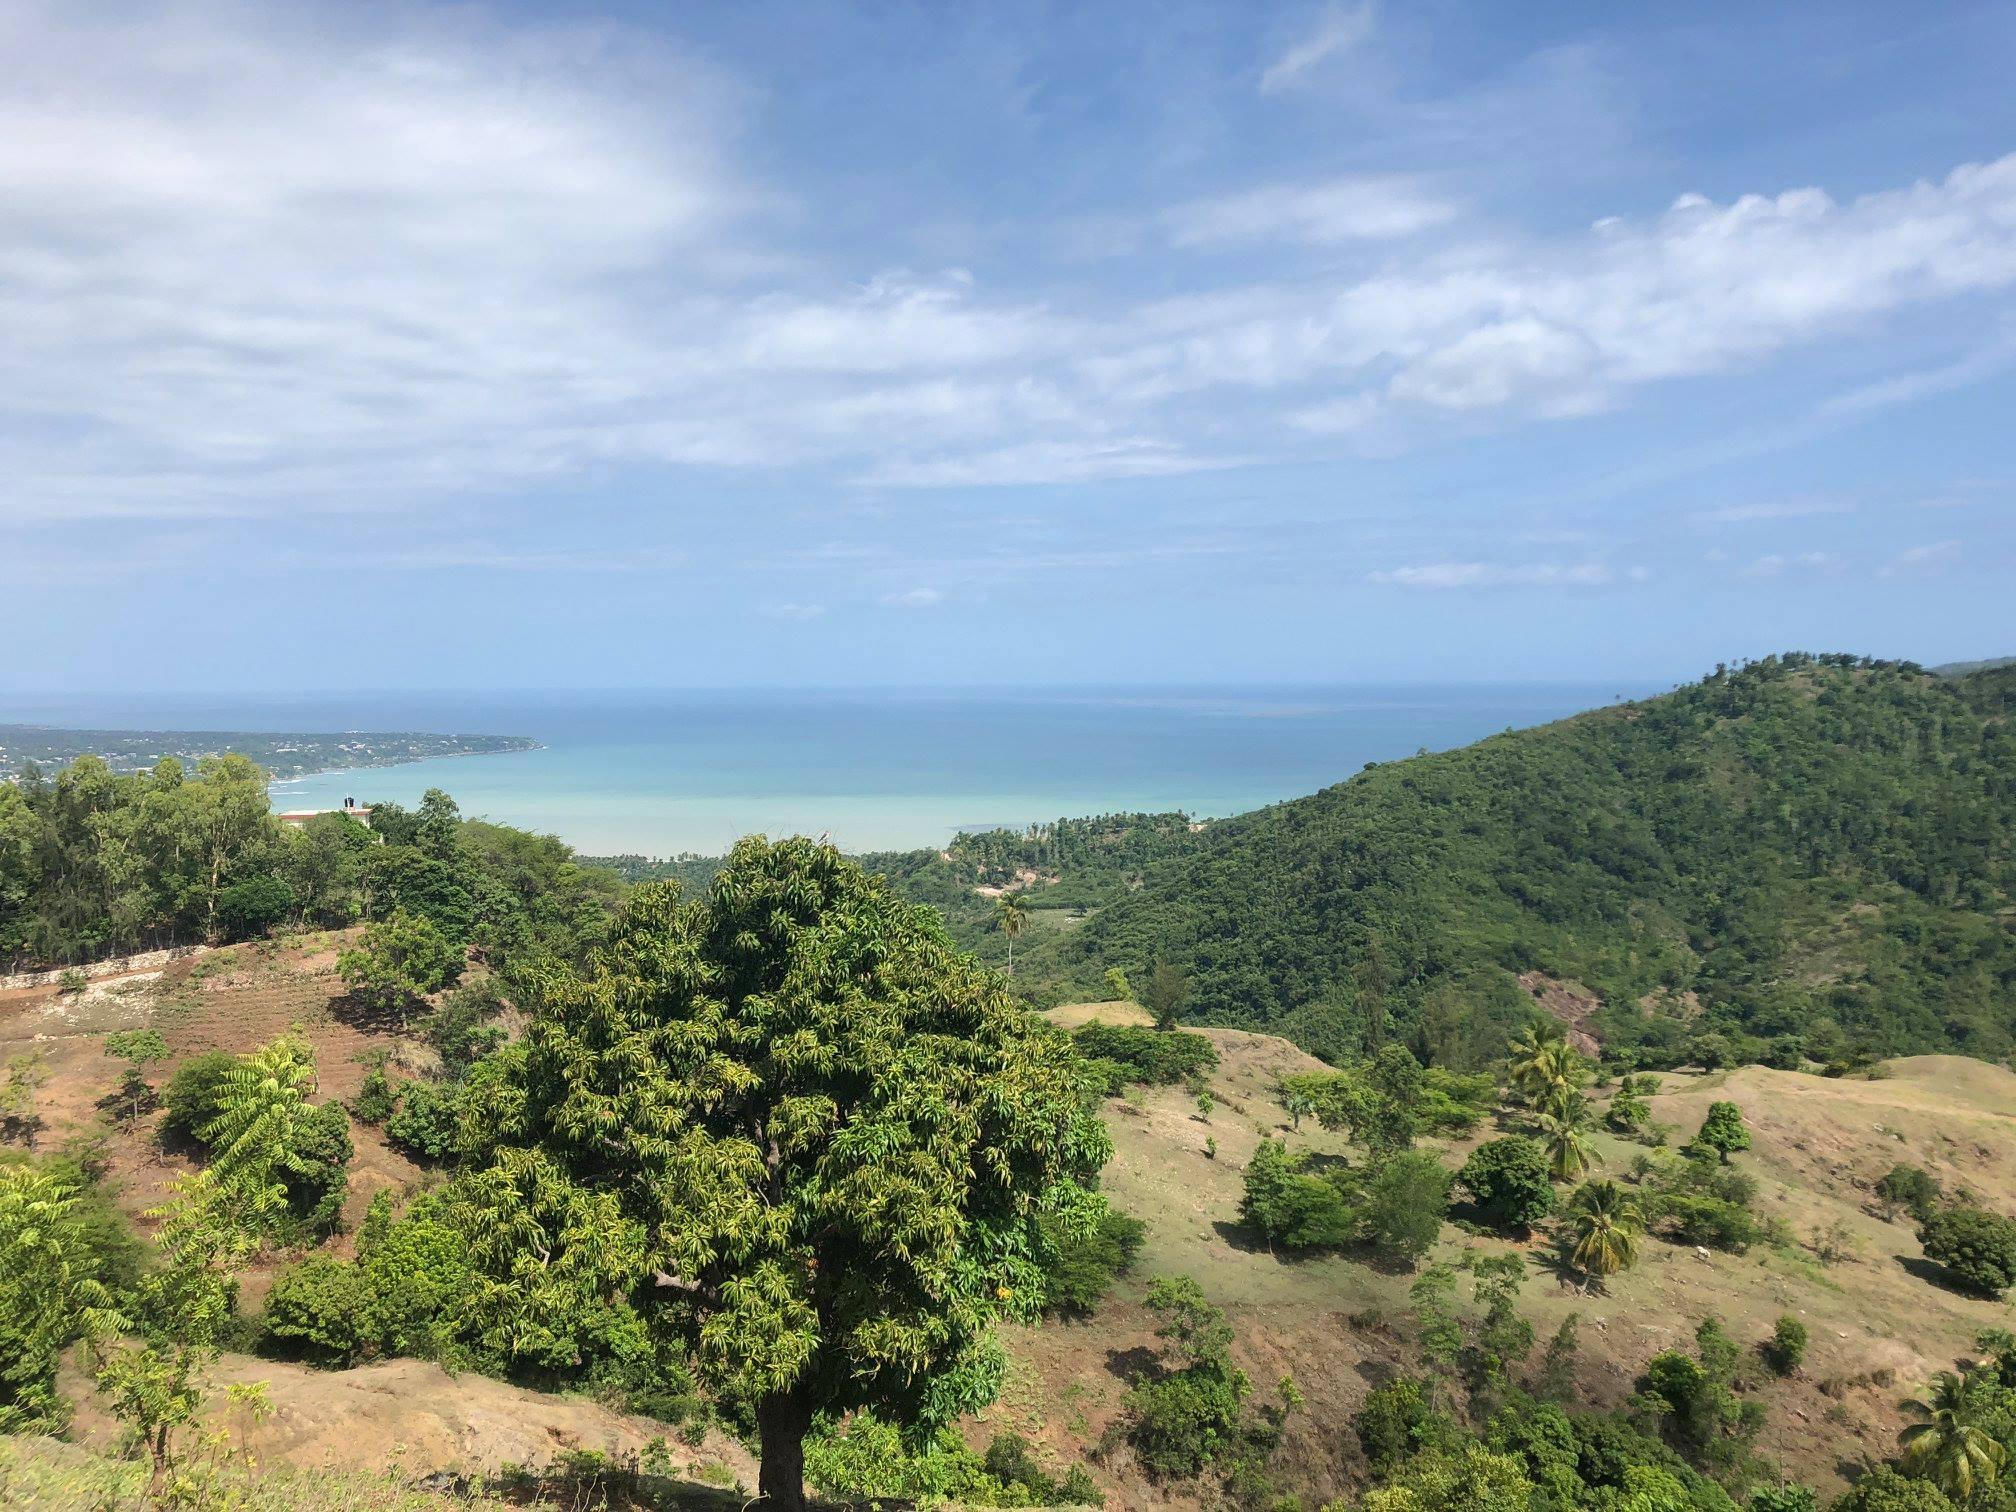 FIDA_Haiti_Bay of Jacmel.jpg